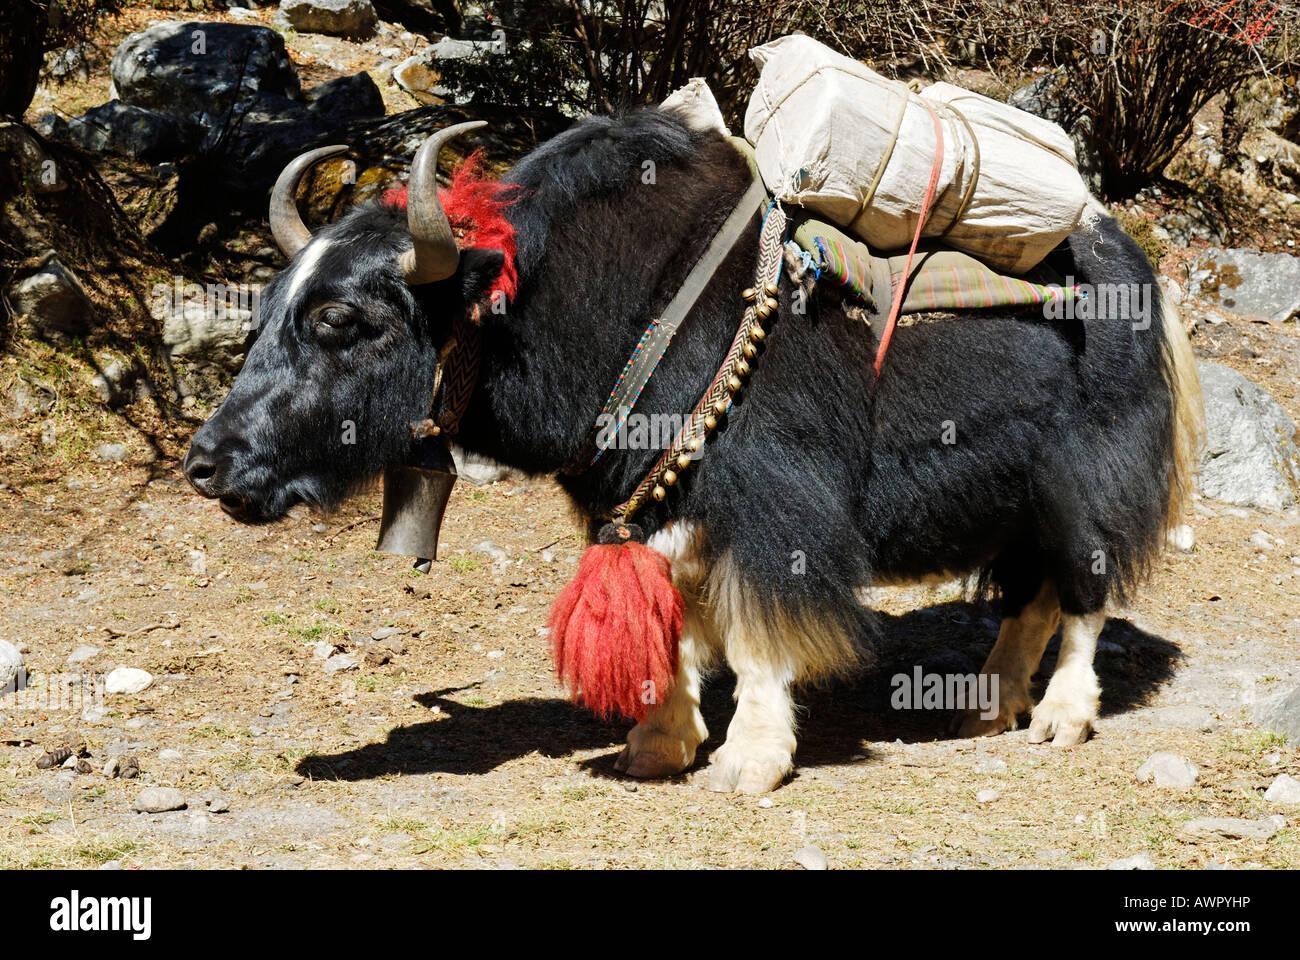 Yak with burden, Sagarmatha National Park, Khumbu Himal, Nepal - Stock Image